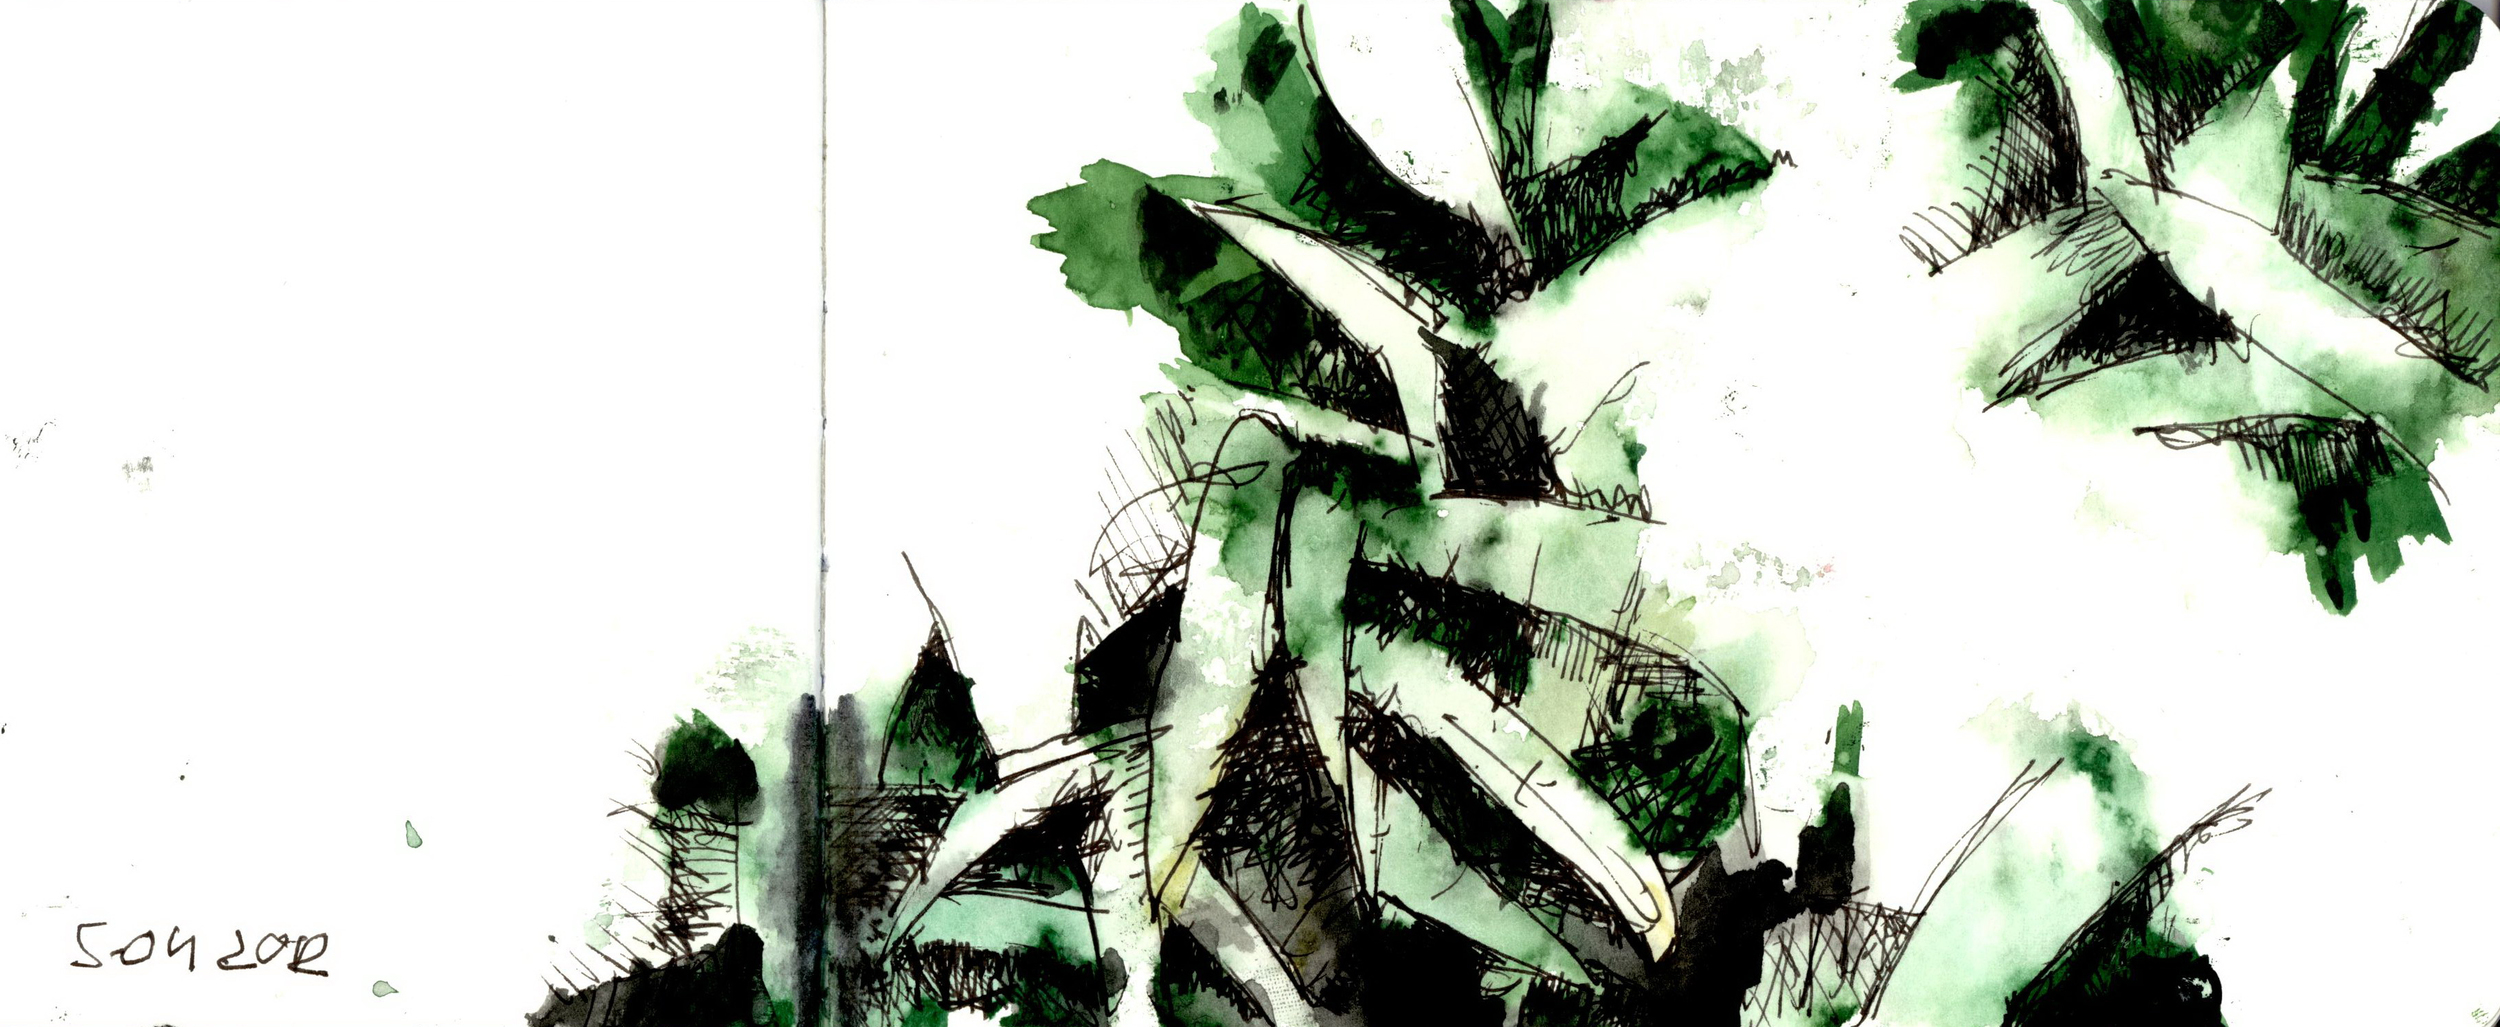 5.04.2012 Nature